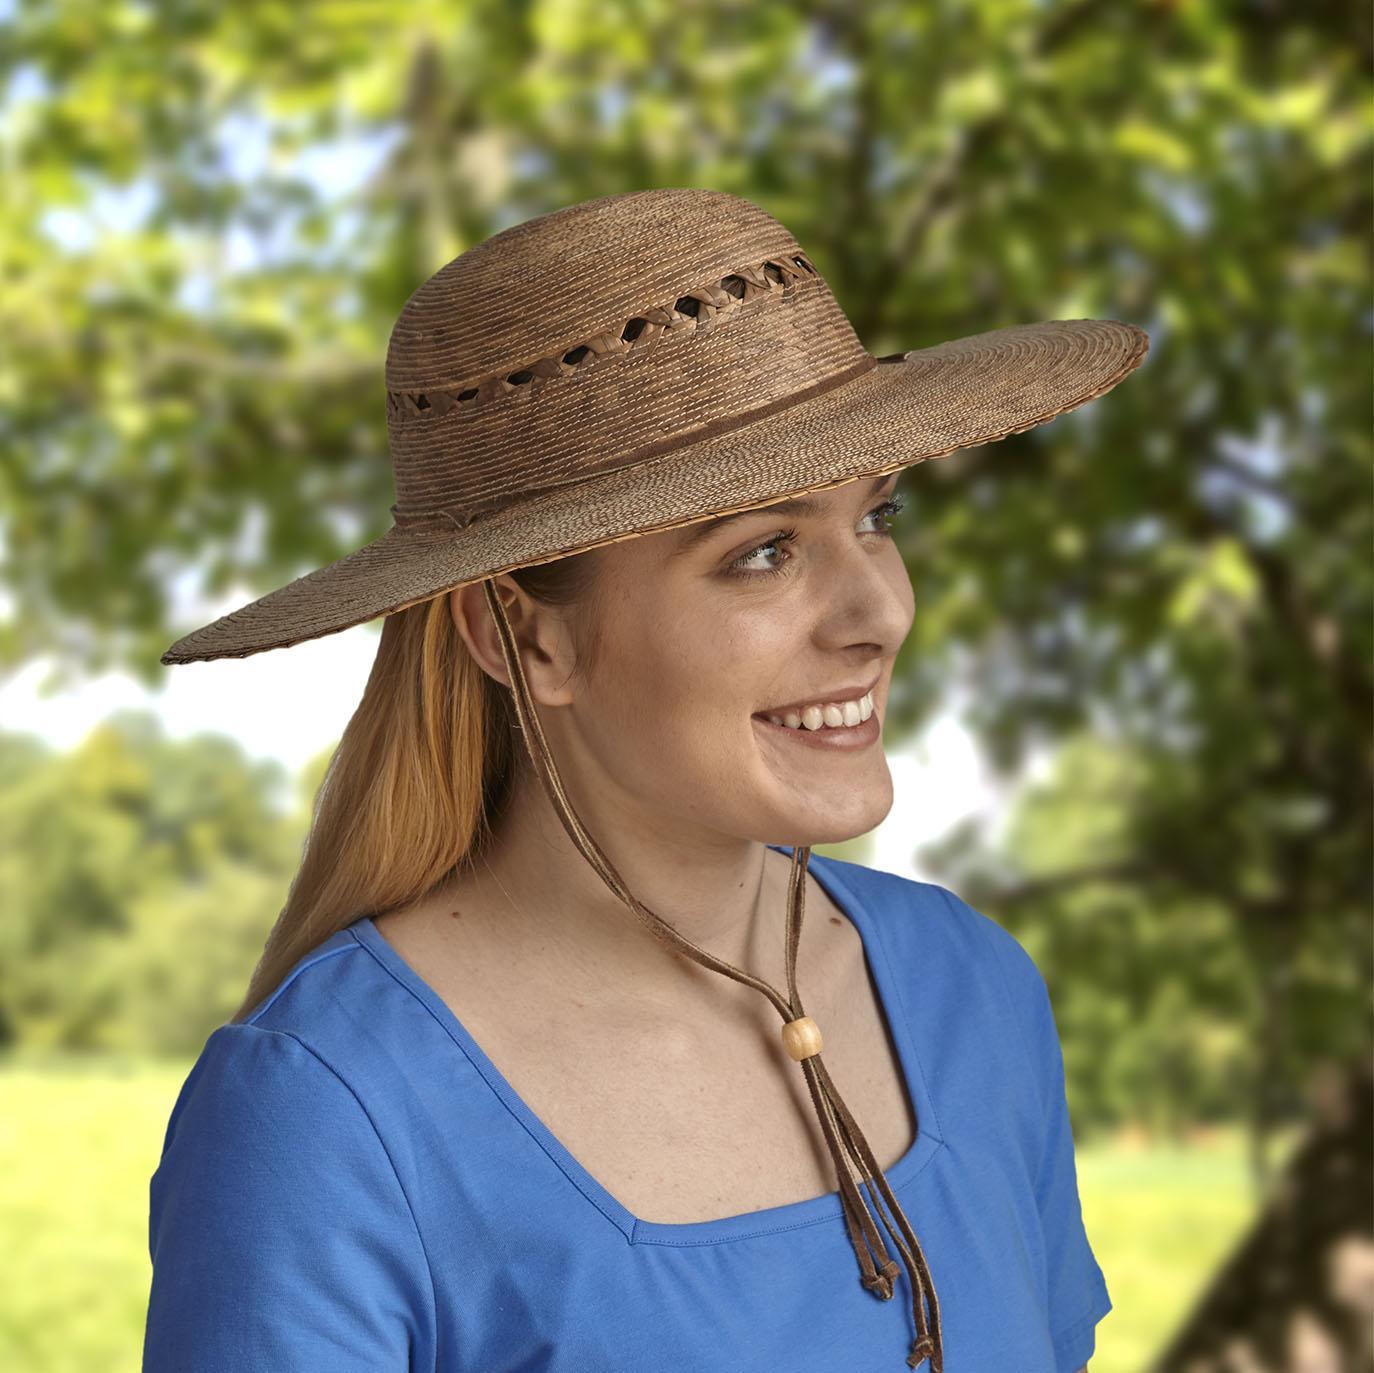 Award-winning Gardening Hat offers 50+ UPF sun protection.